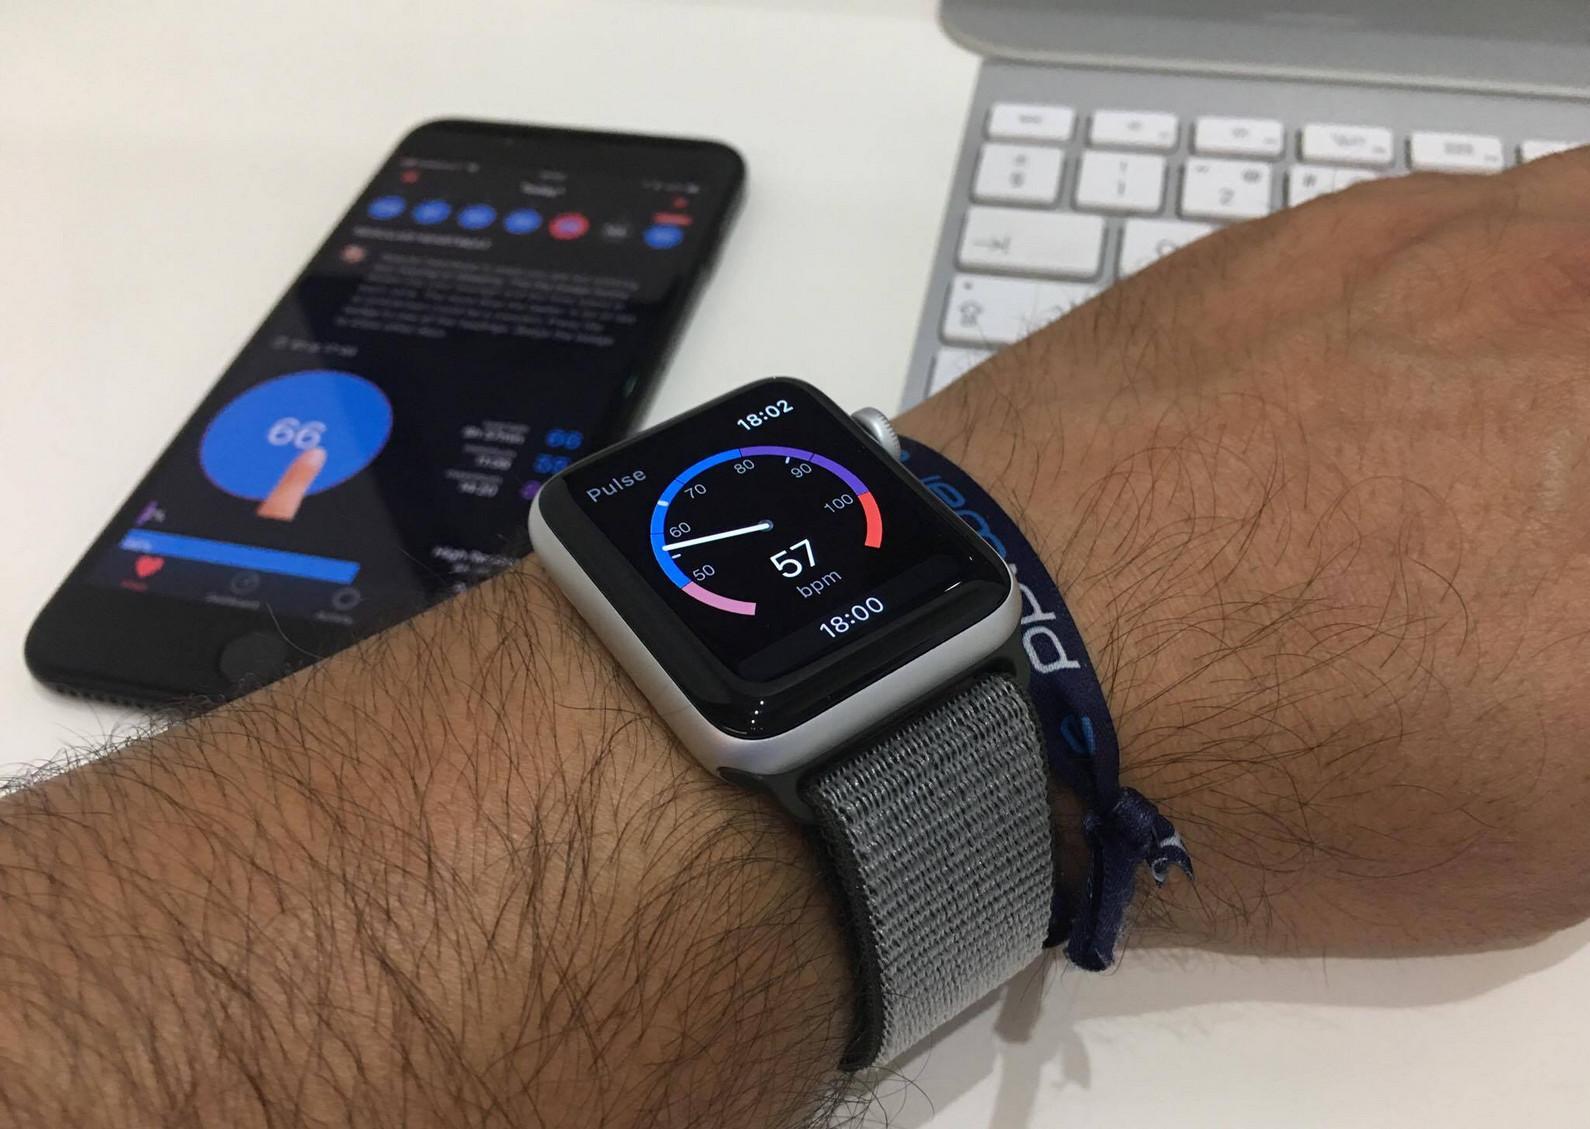 d737a05cfd4 5 Apps de saúde para o Apple Watch - Pplware